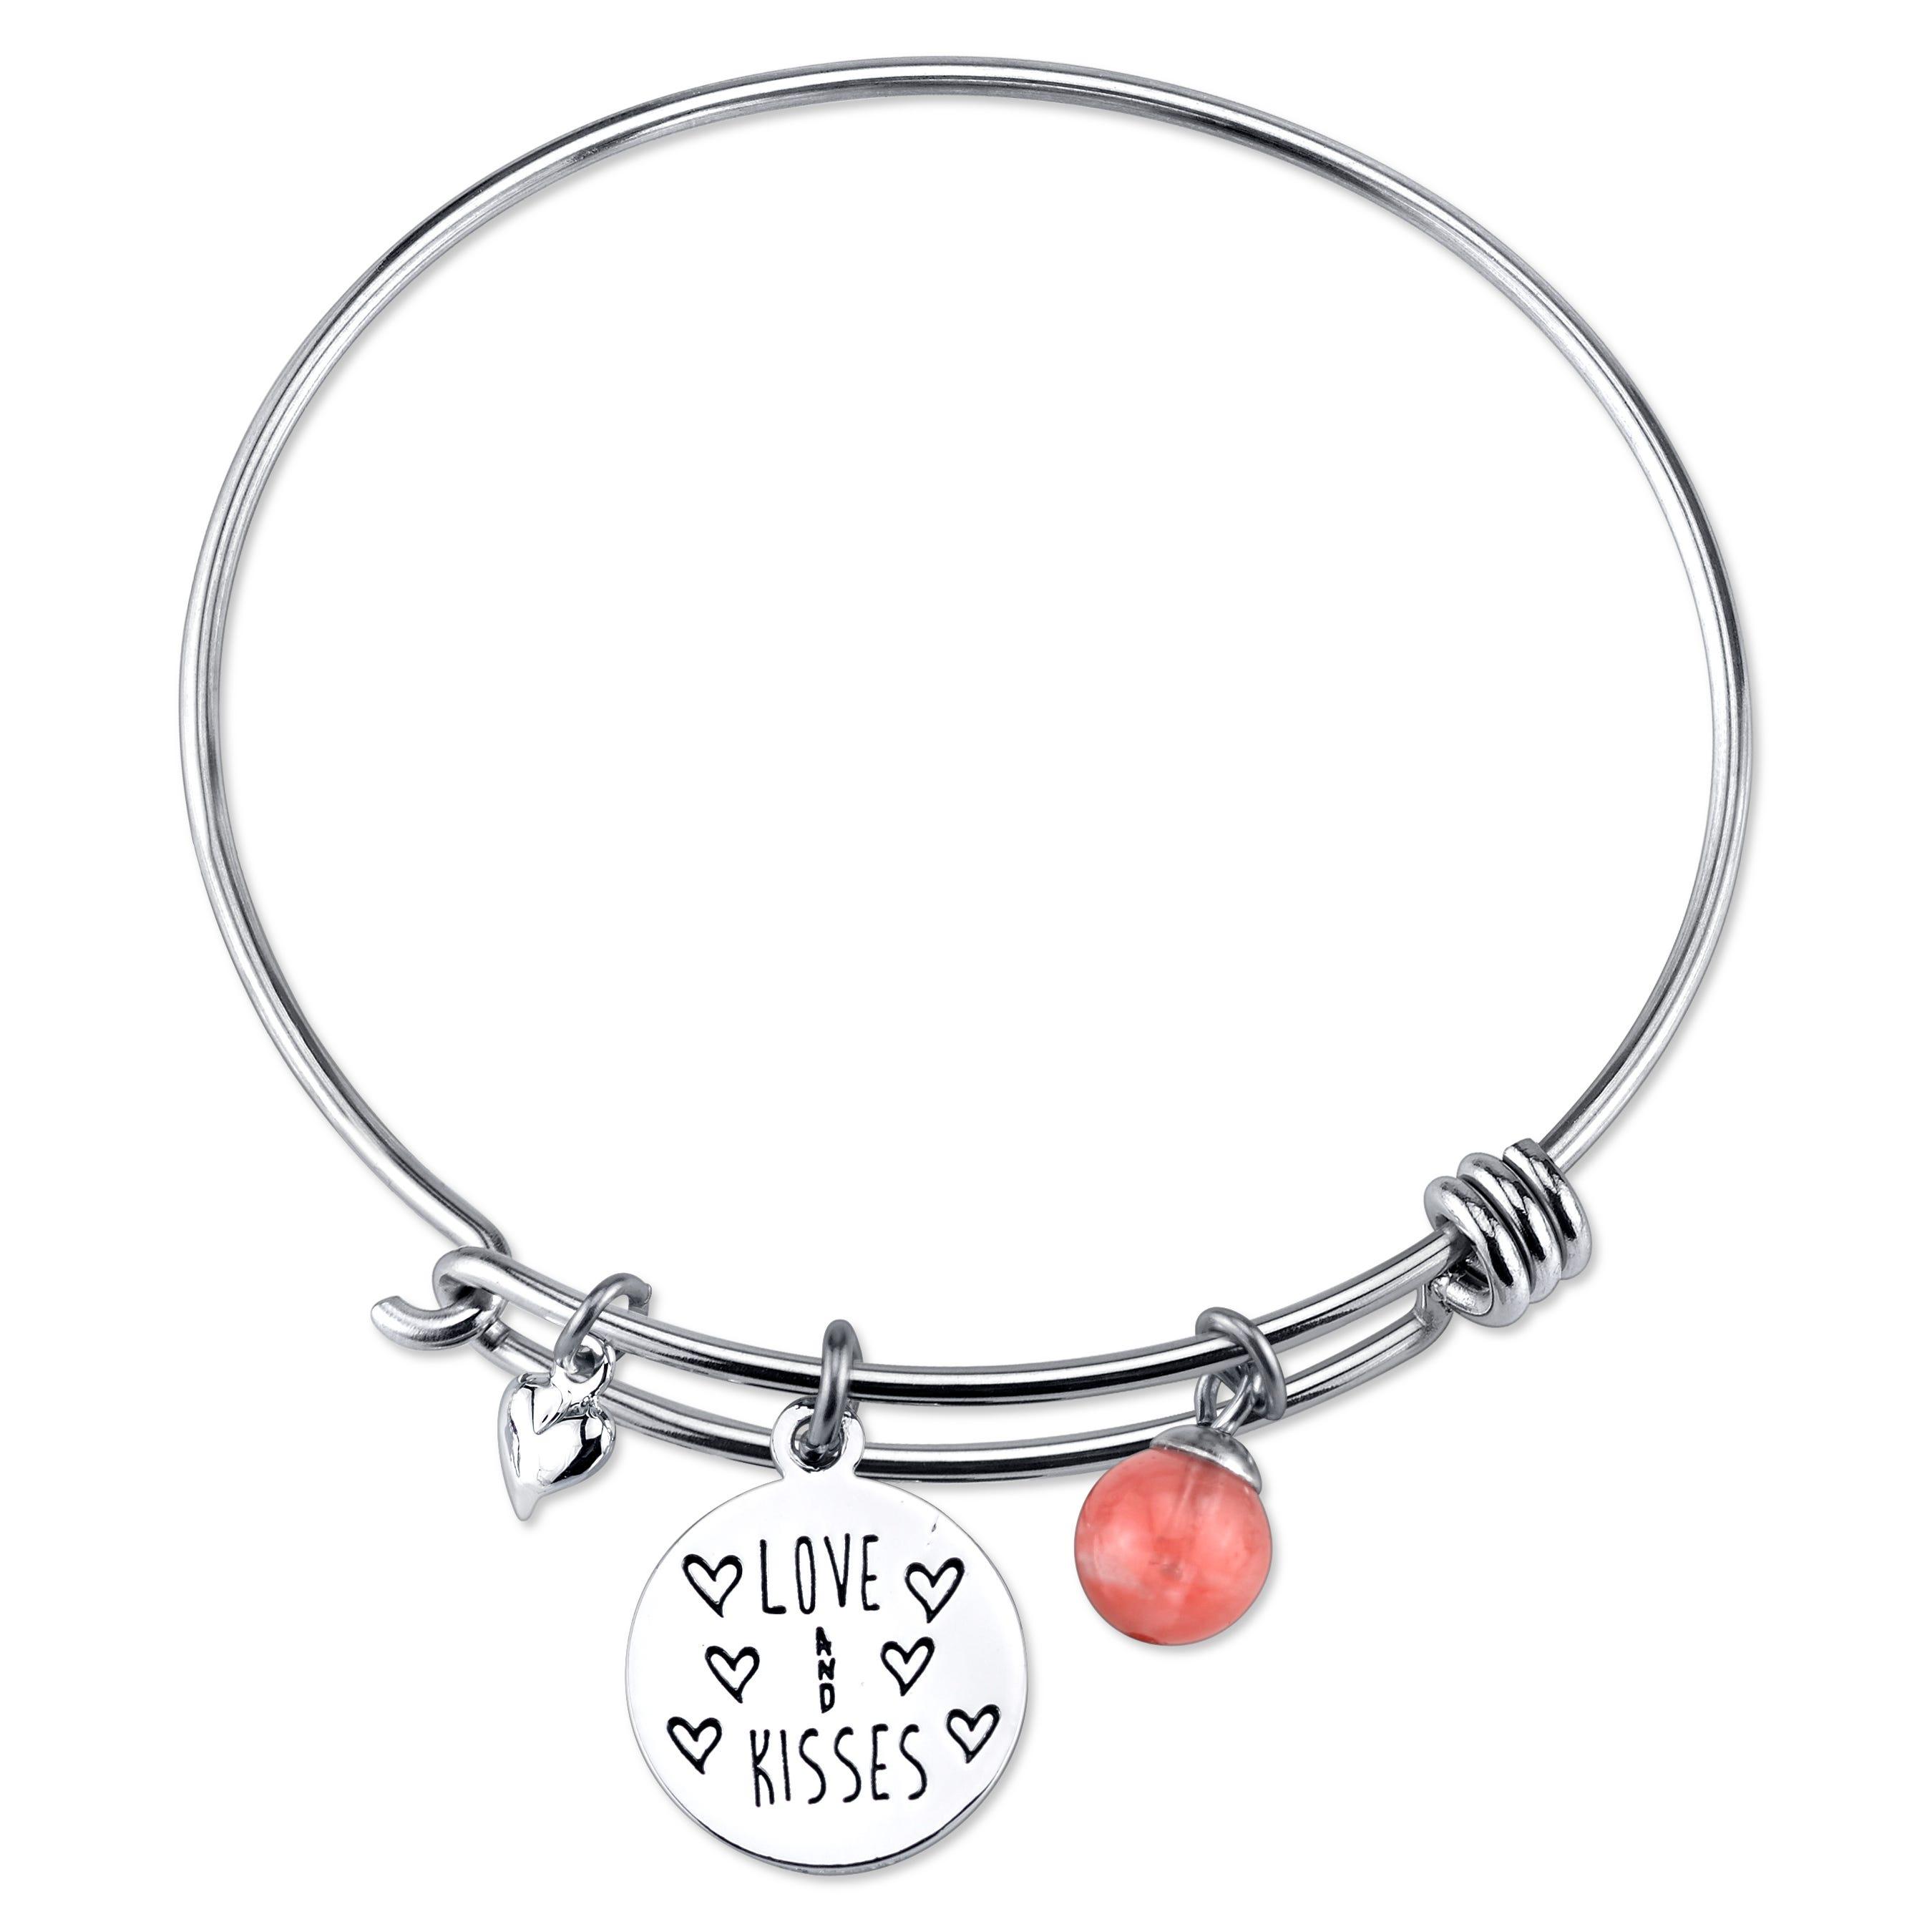 DISNEY© Minnie Mouse Cherry Quartz Bangle Bracelet in Sterling Silver